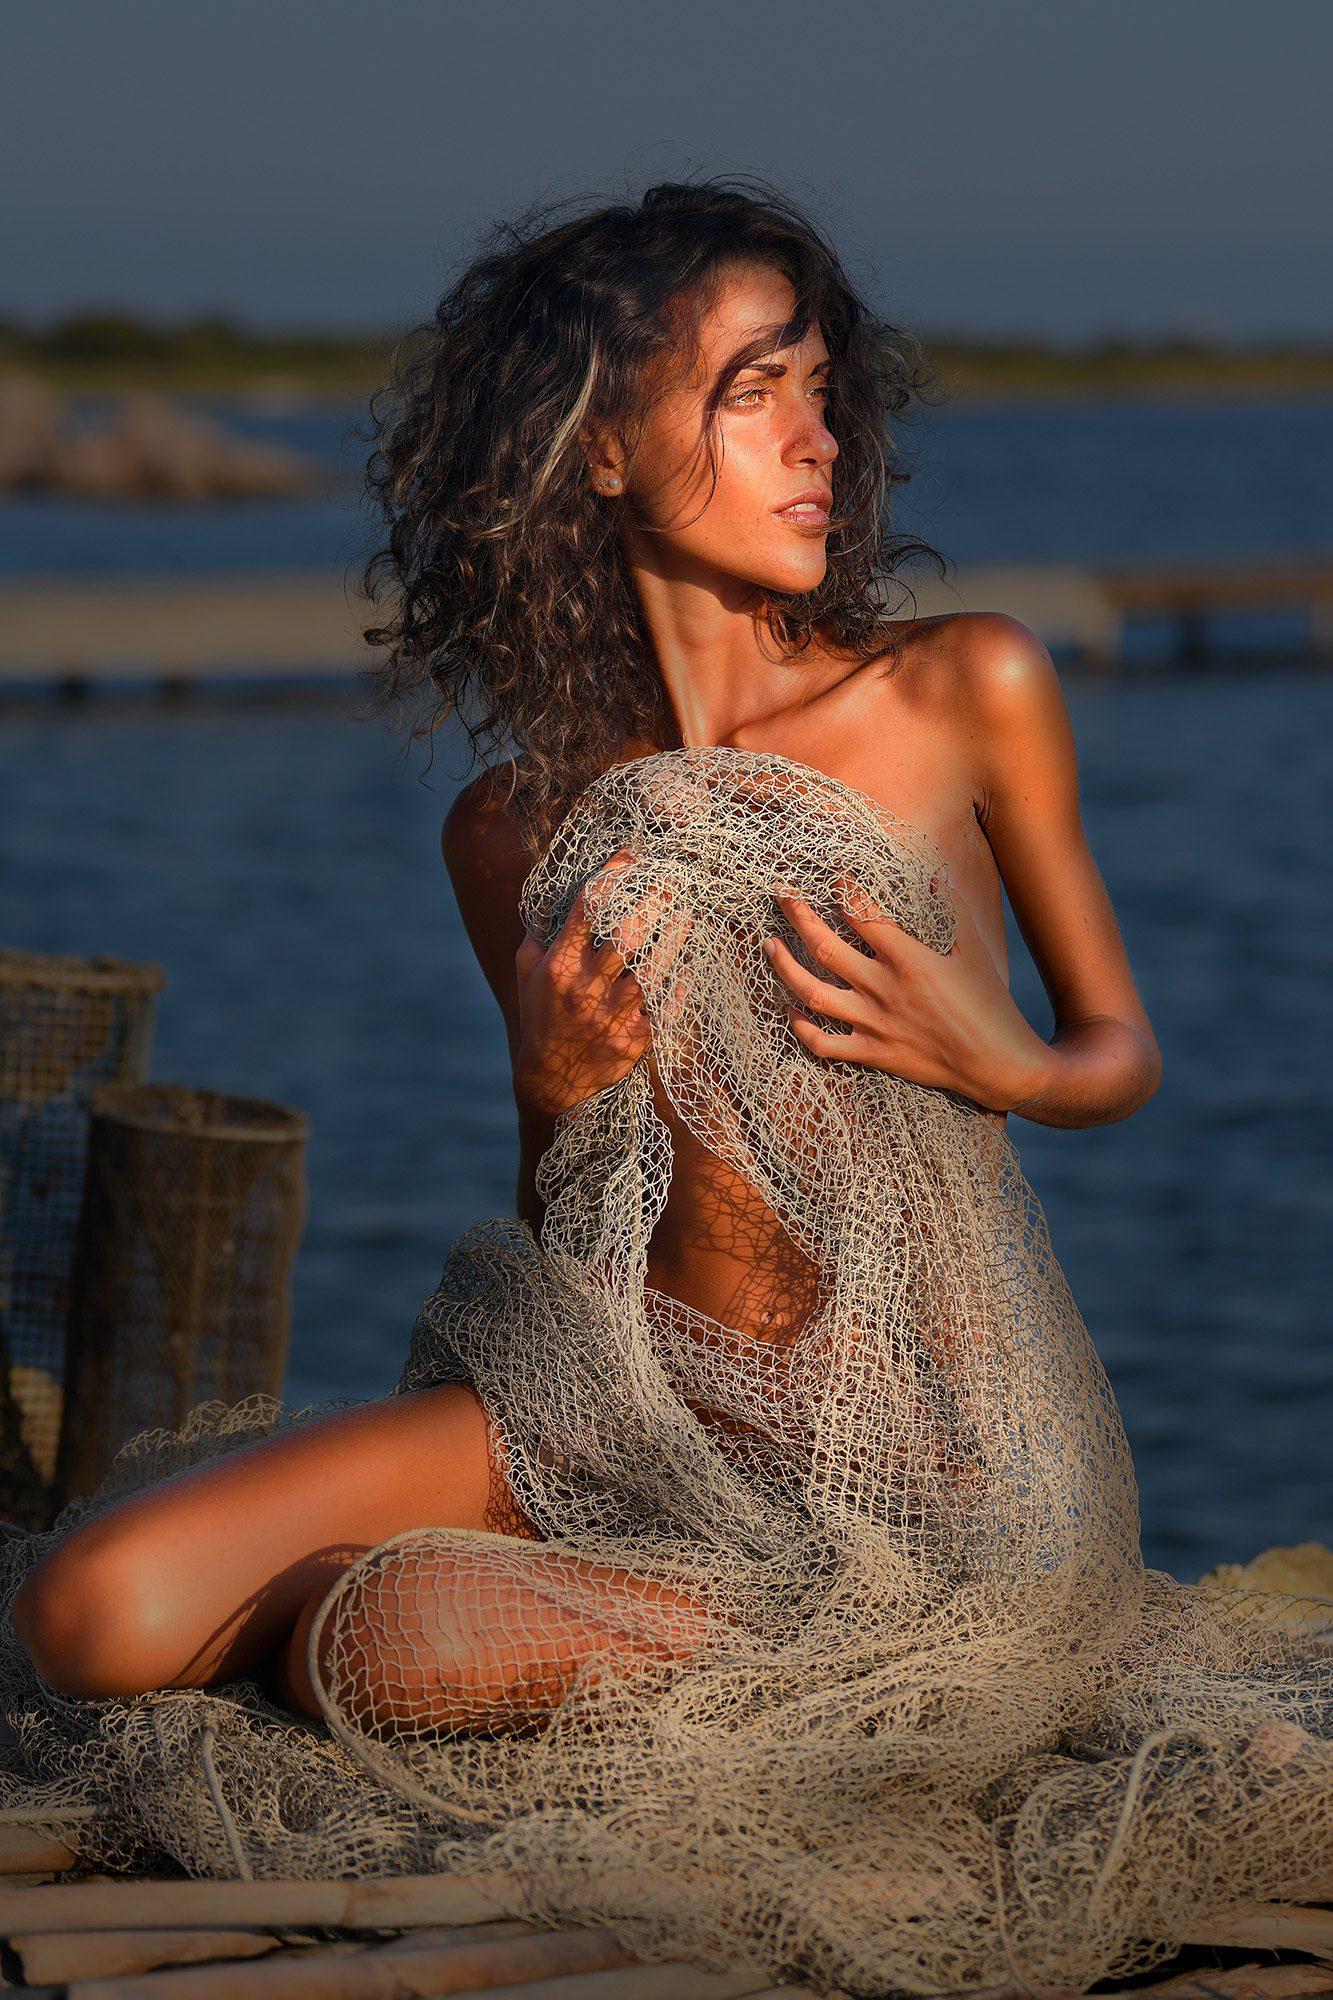 VENUS Gallery - Giorgio Taddia Photography